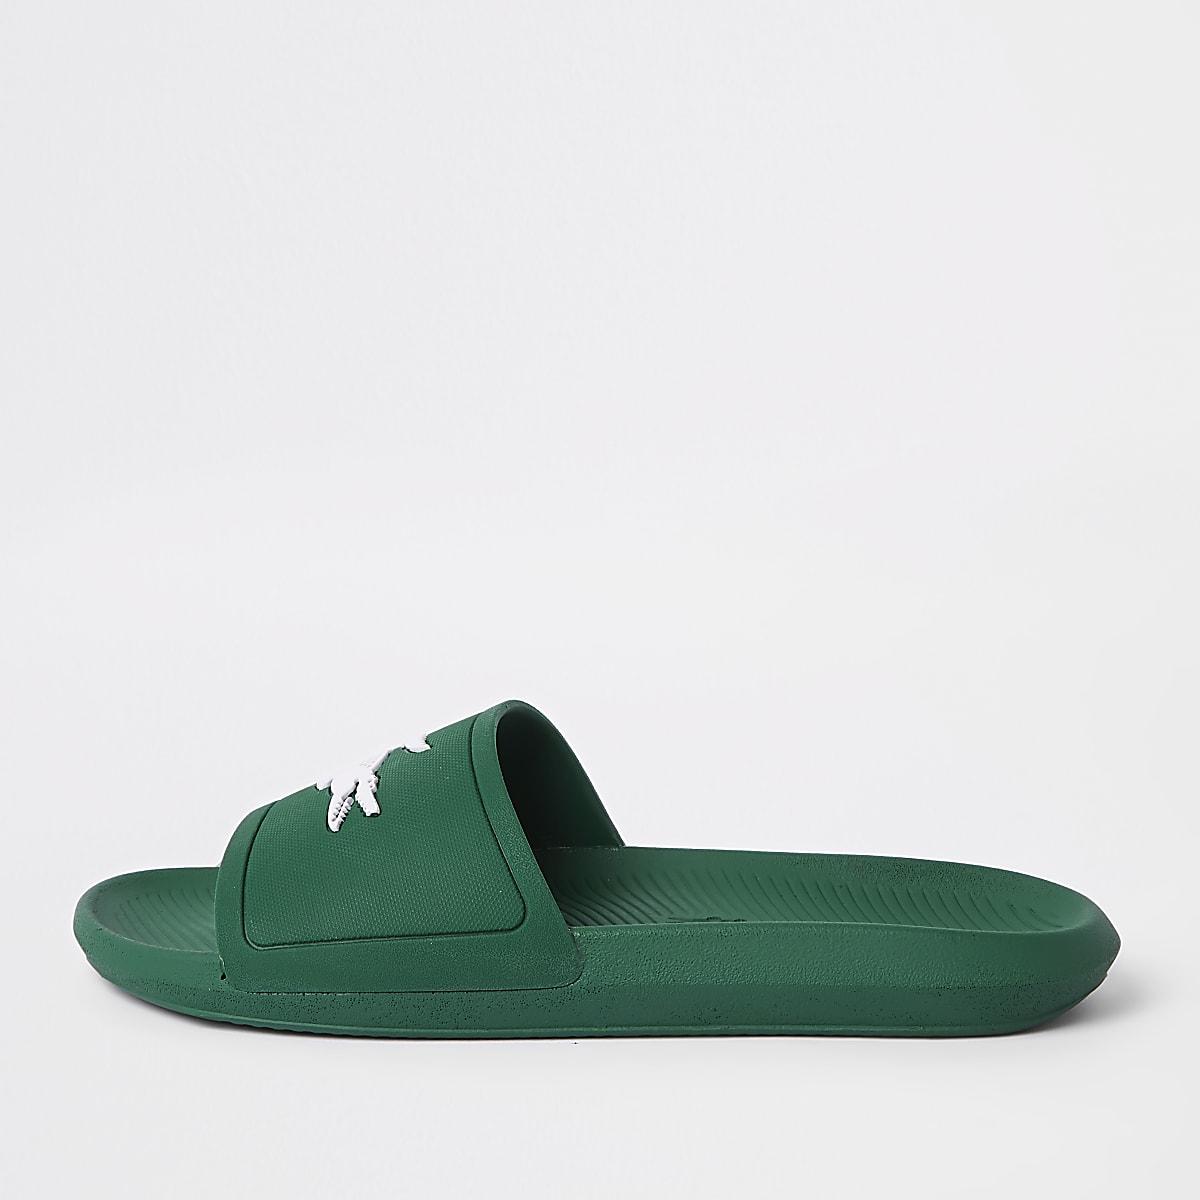 Lacoste green sliders